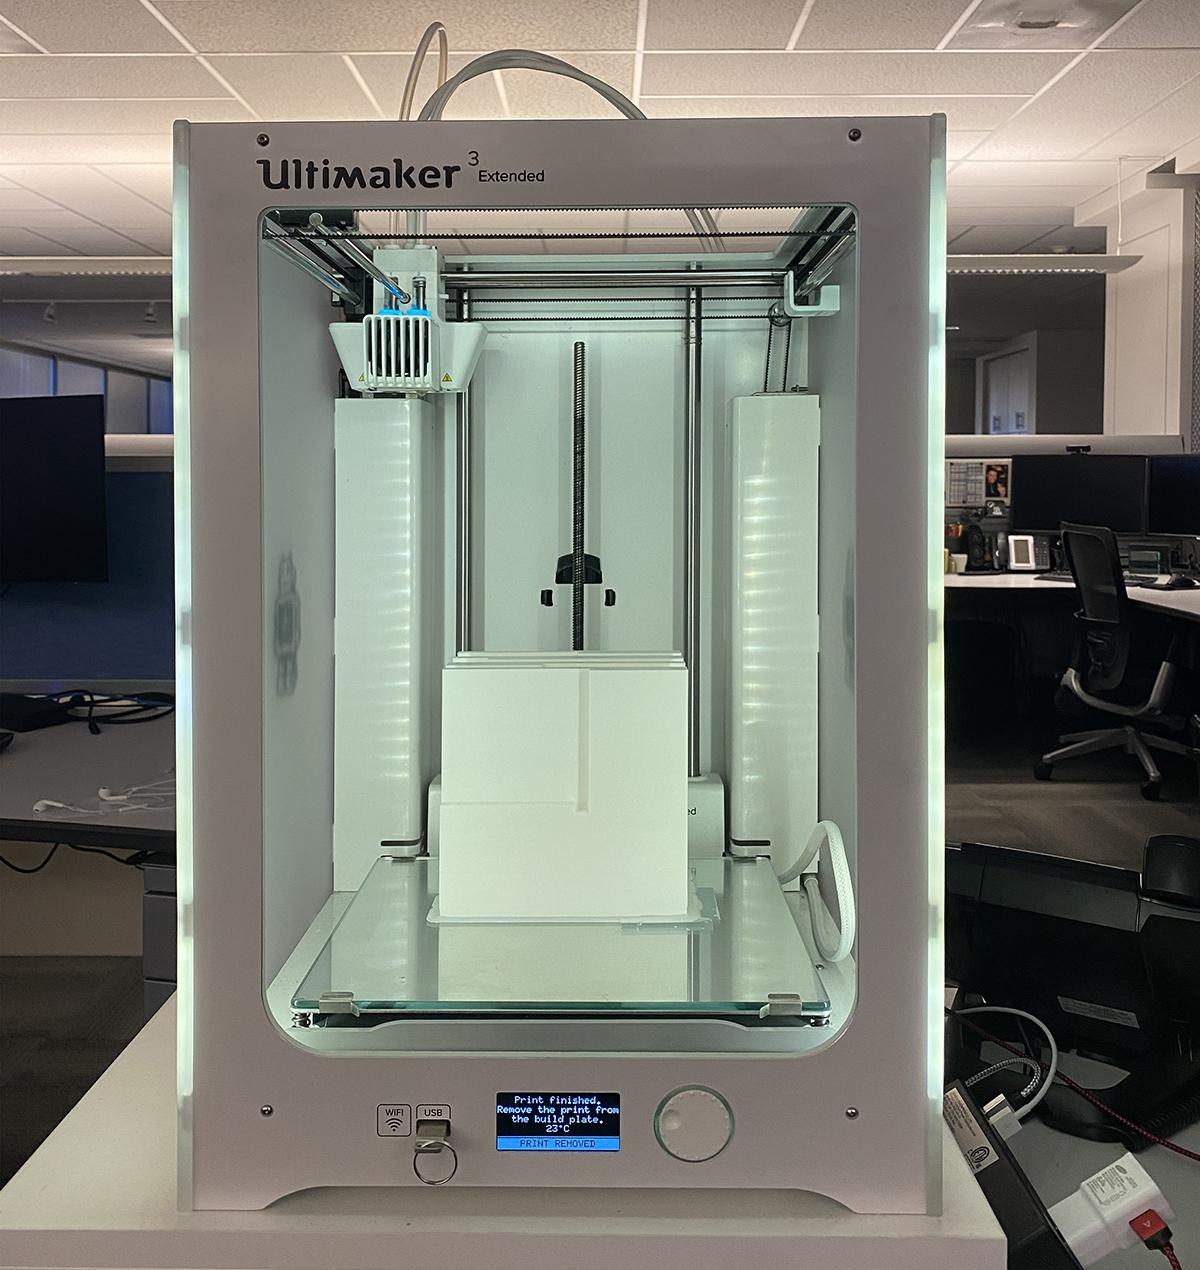 Ultimaker 3 Extended 3D Printer - Printing Architectural 3D Models